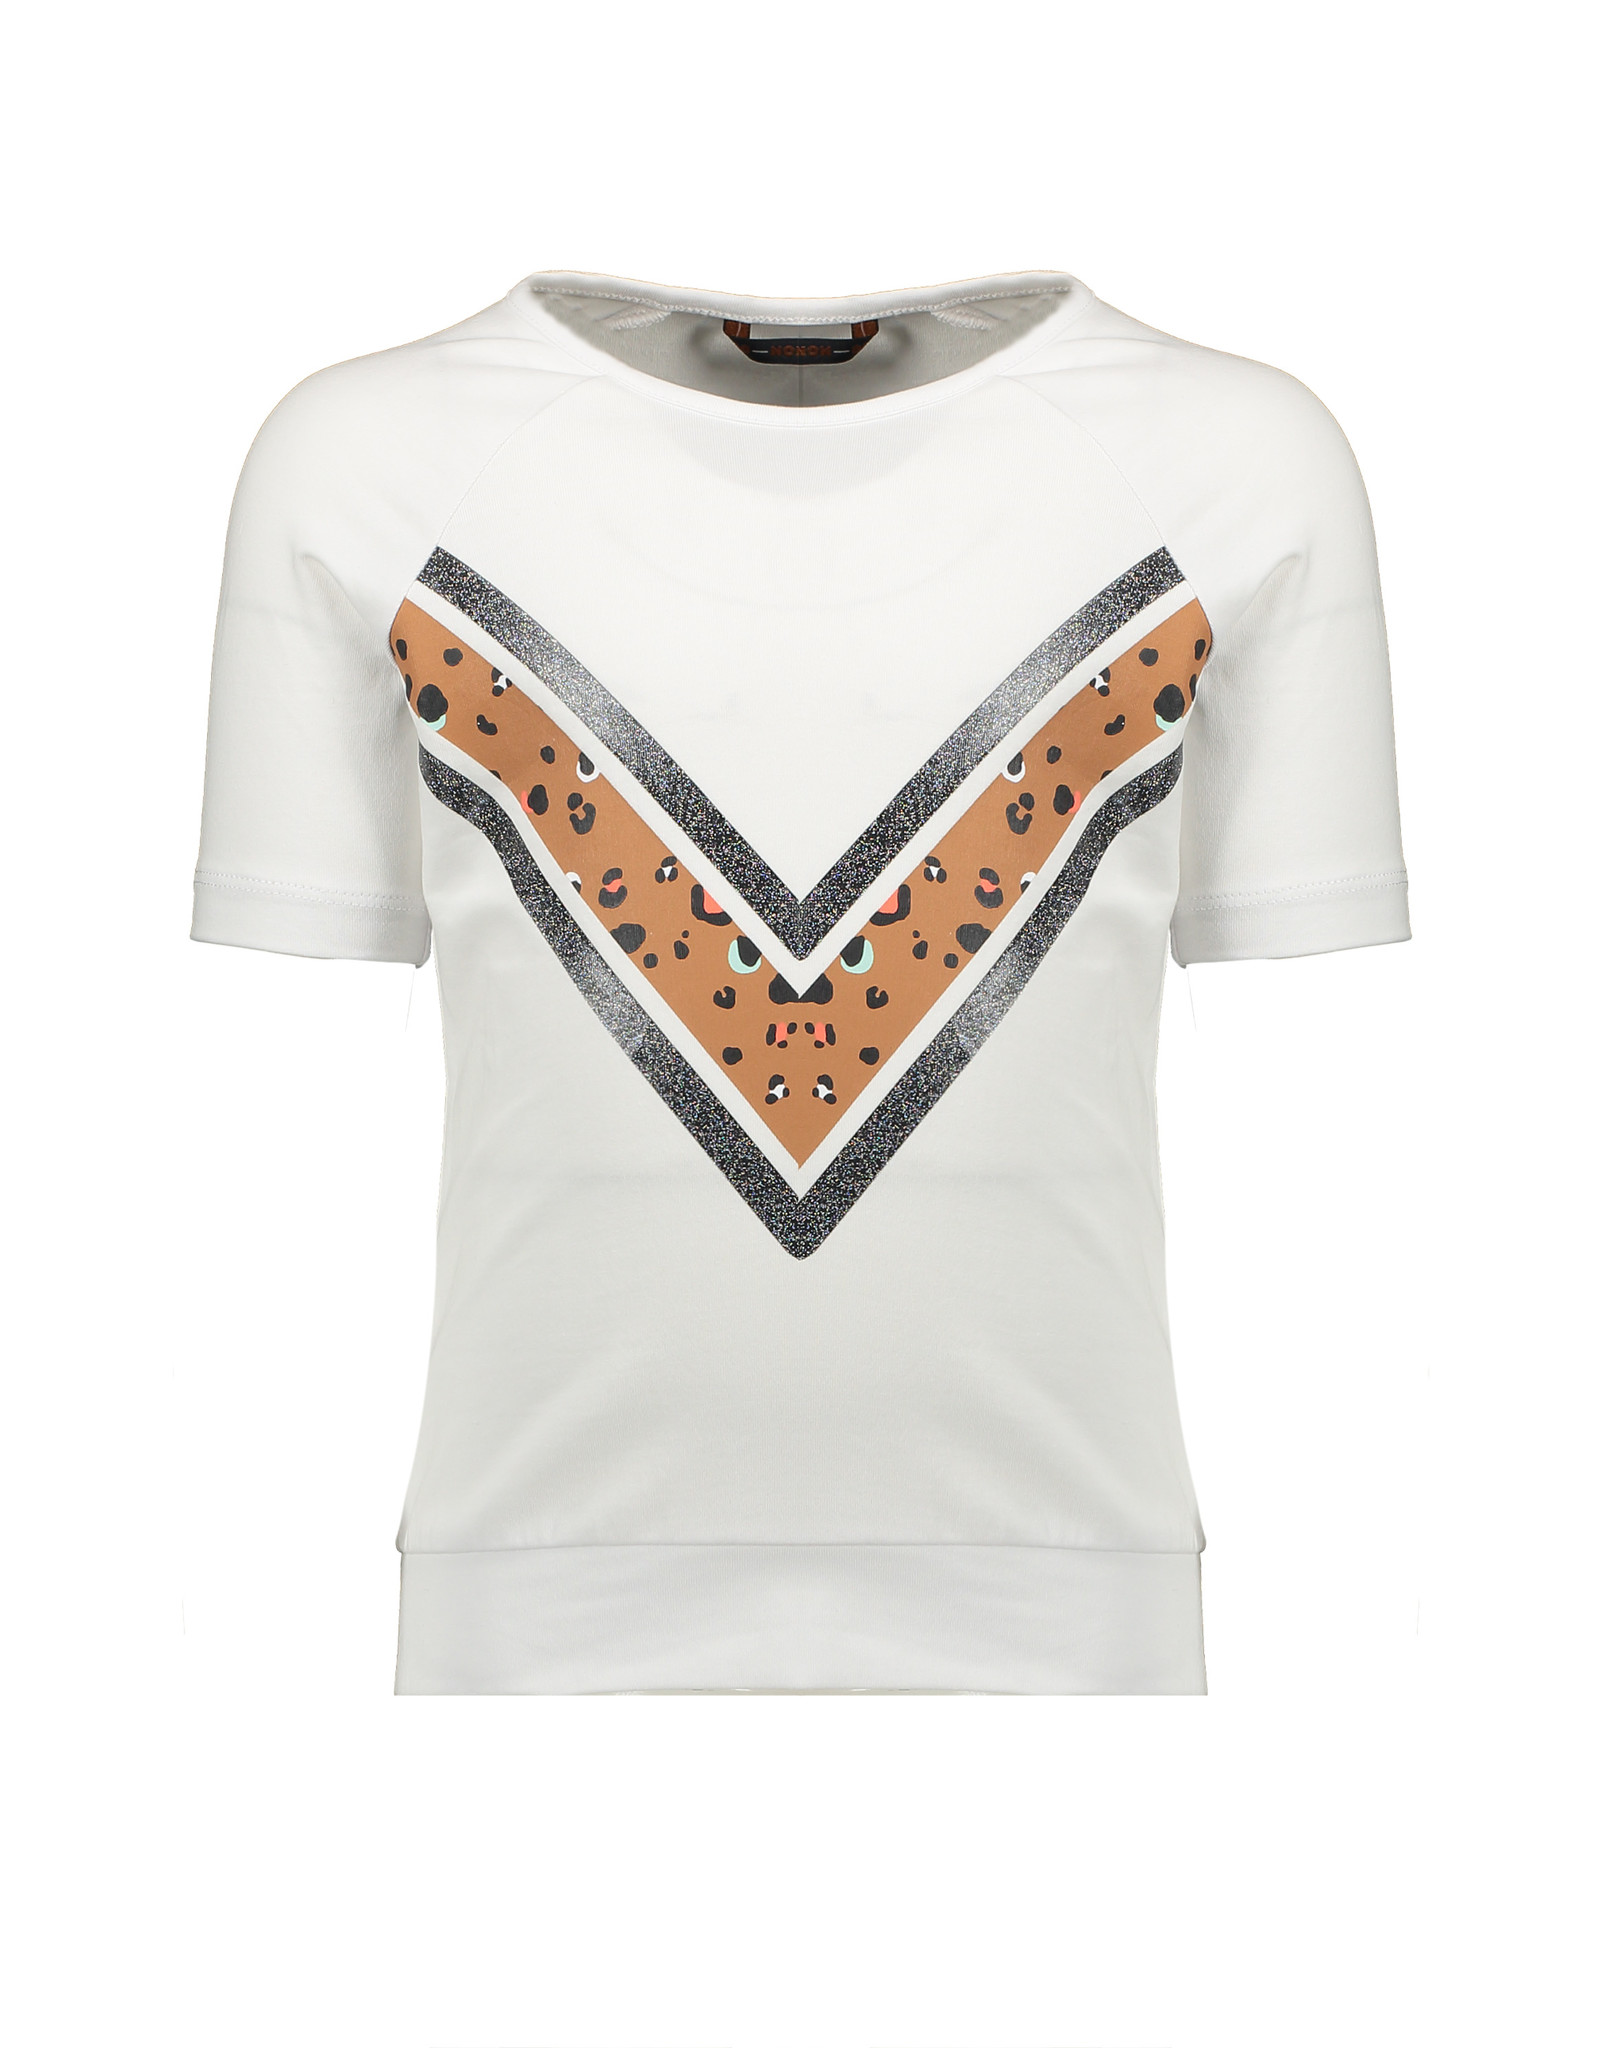 NONO NONO Kamou half sleeve / cut out shirt Snow White